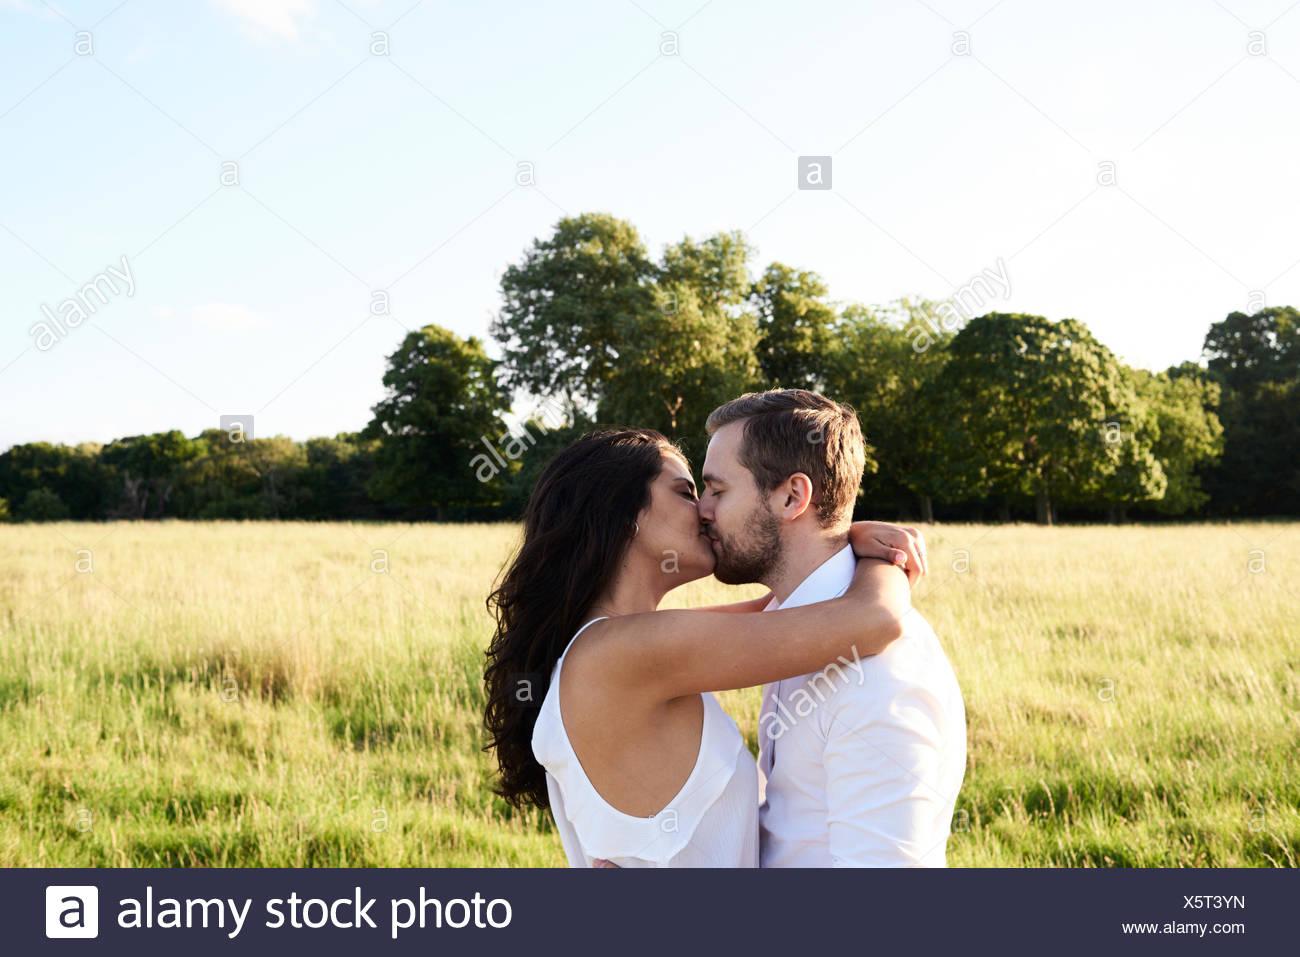 Hampstead dating